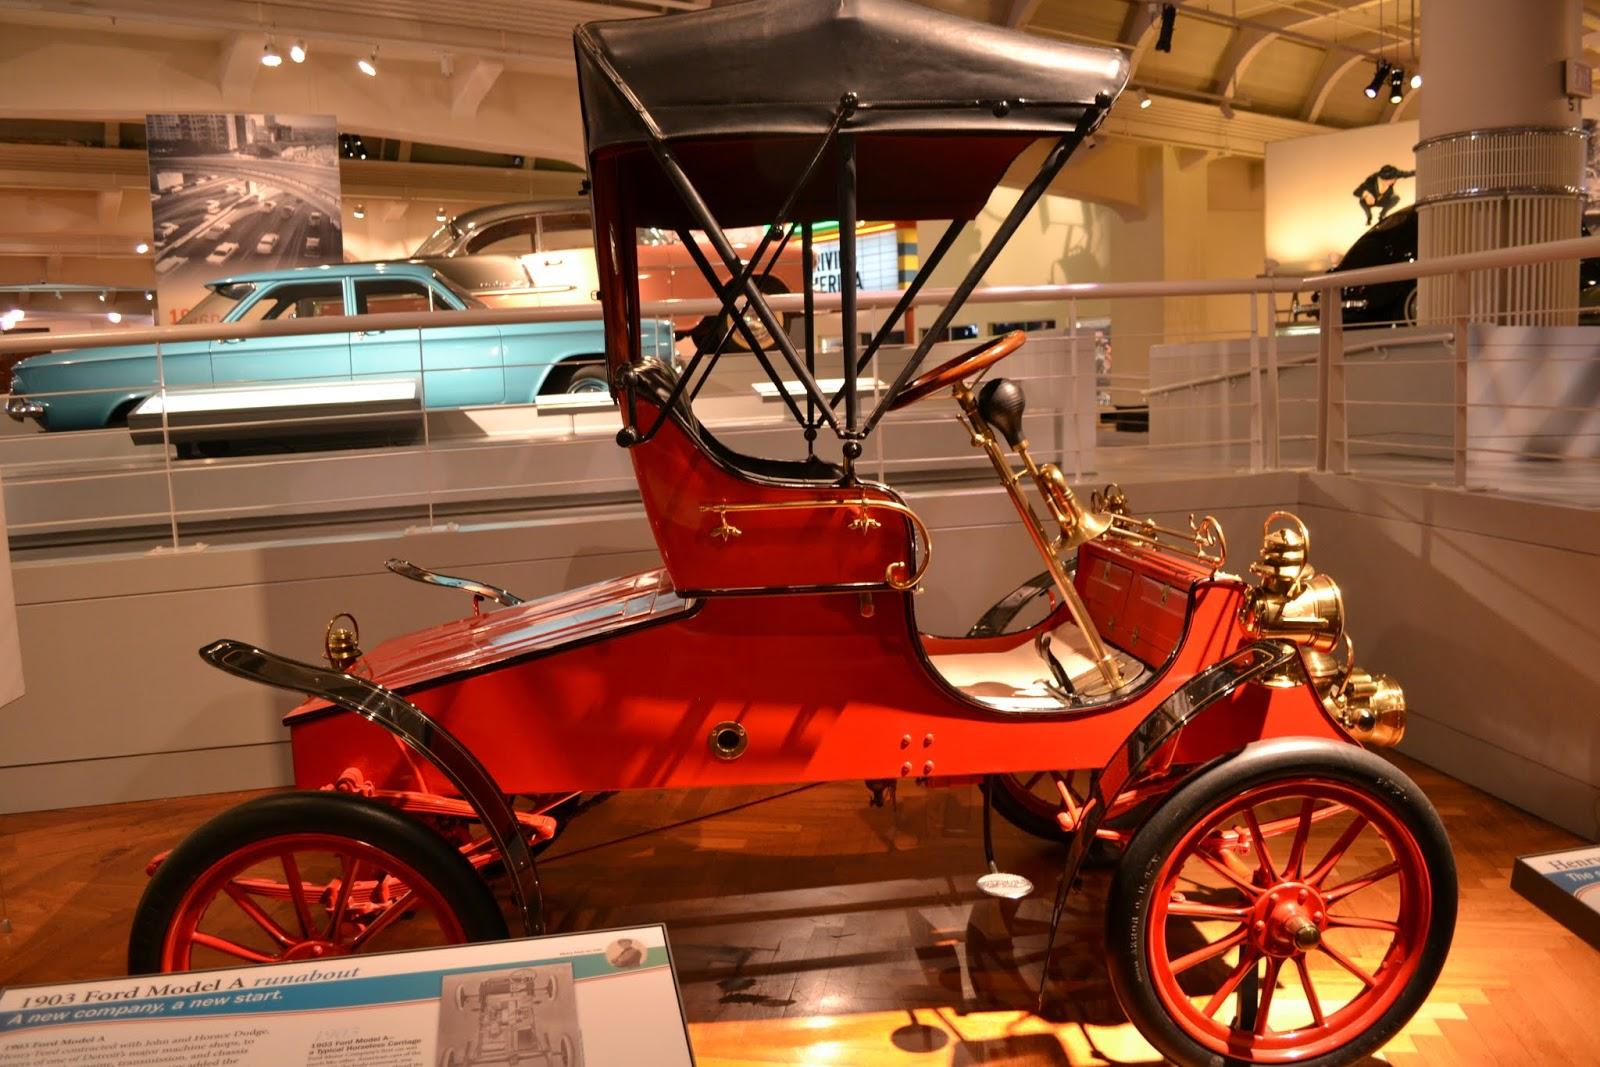 Форд, 1903 года выпуска, модель А. Музей Генри Форда. Дирборн, Мичиган (Henry Ford Museum, Dearborn, MI)